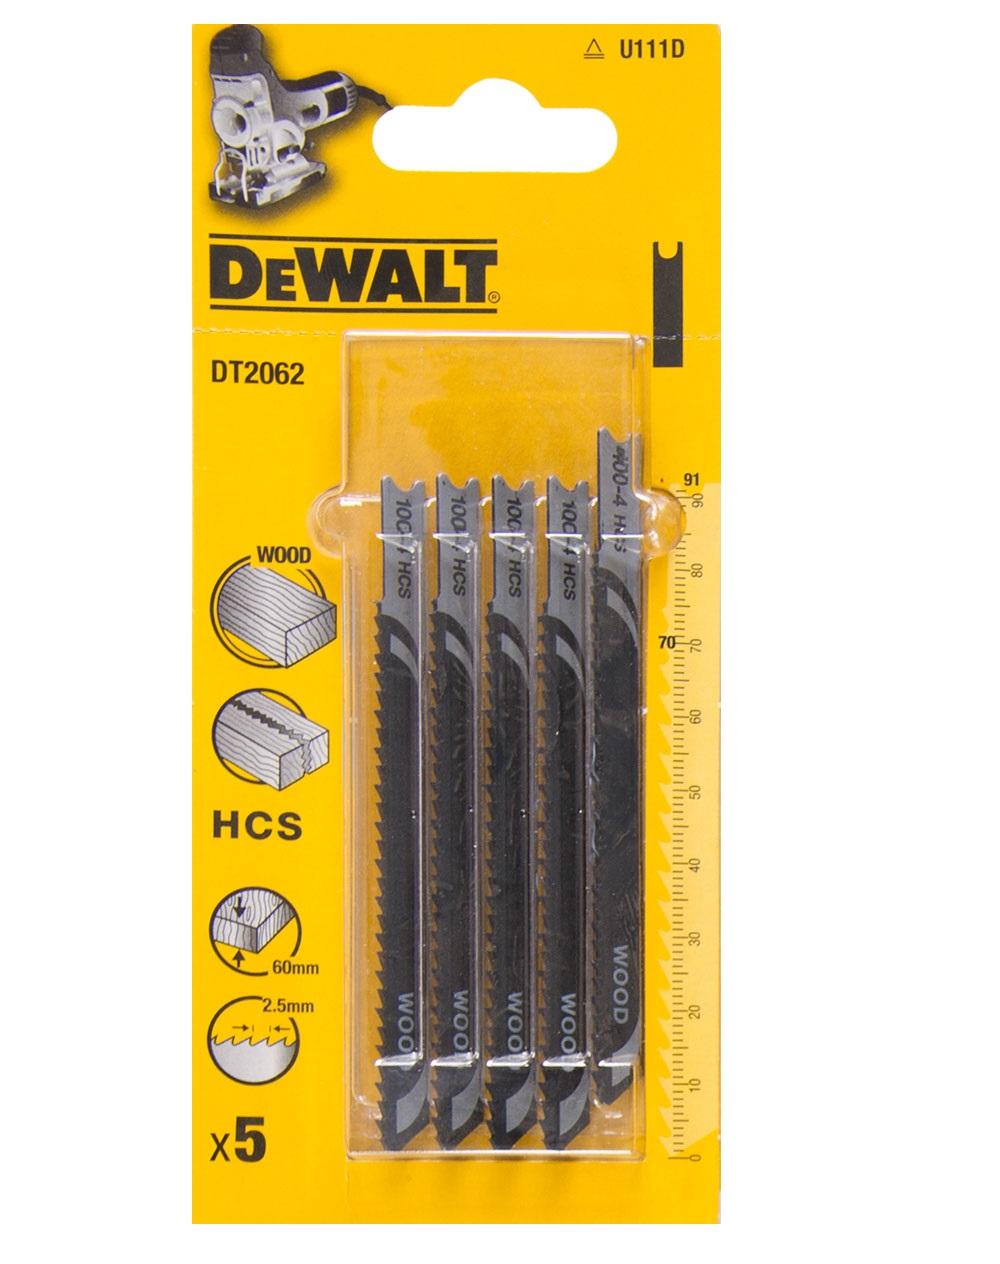 DT2062 DeWALT pilový plátek HCS 91 mm na dřevo 5ks